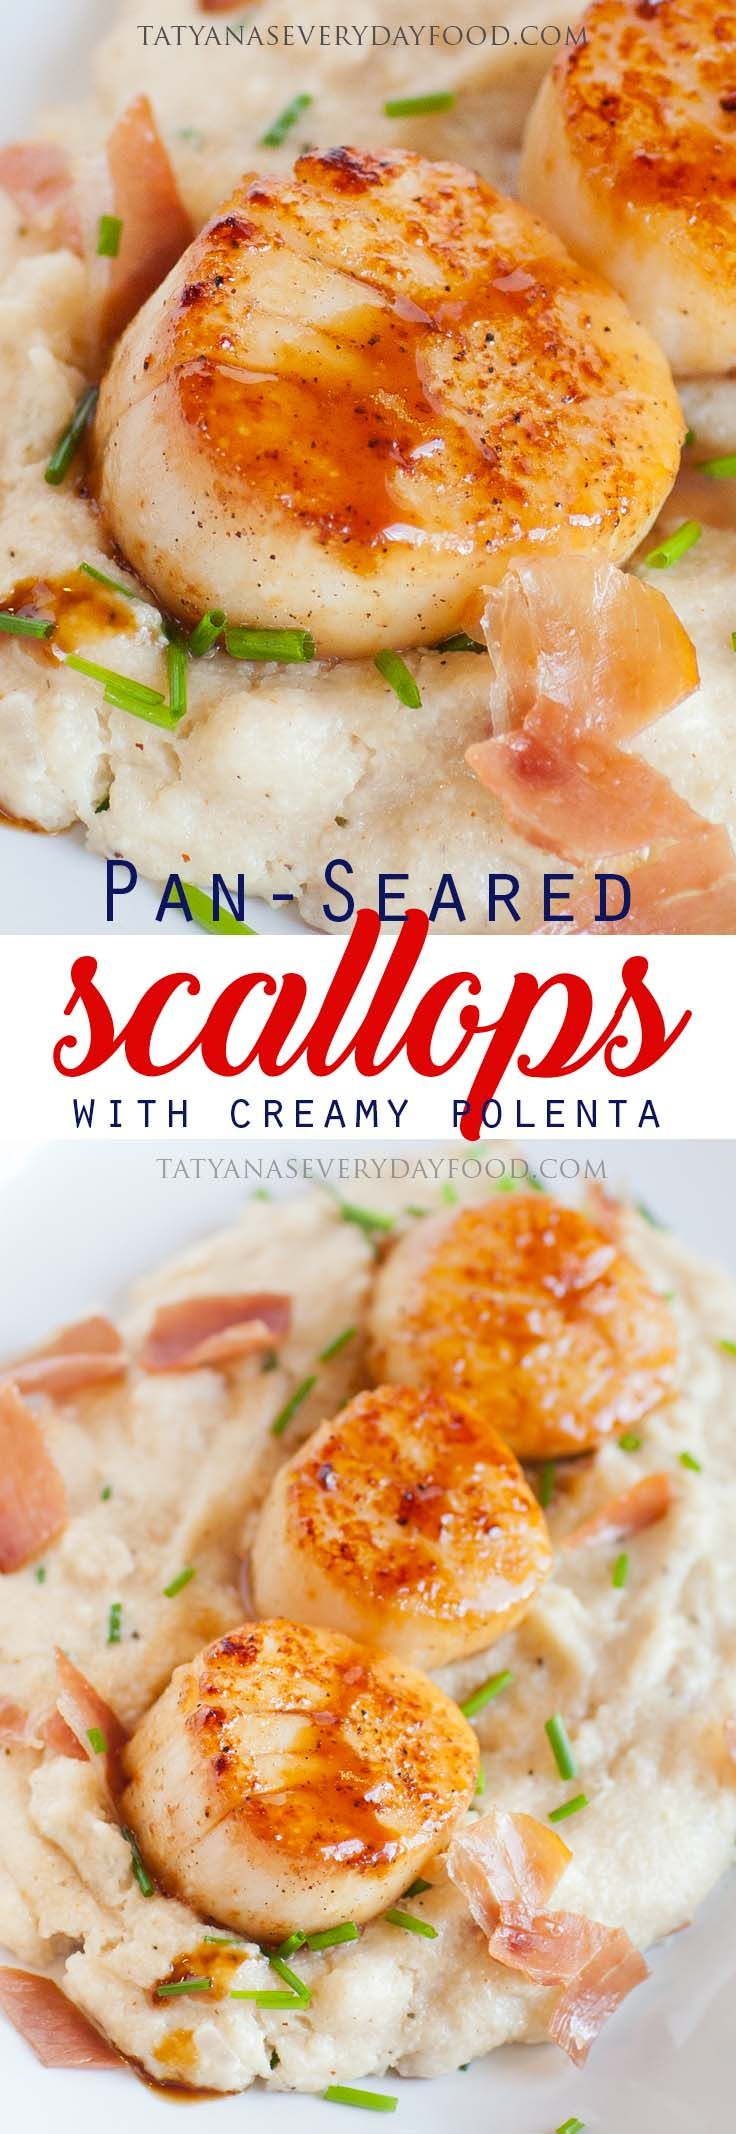 Pan seared scallops with prosciutto polenta tatyanas everyday food pan seared scallops with prosciutto polenta tatyanas everyday food scallop recipesscallop dishespan forumfinder Gallery